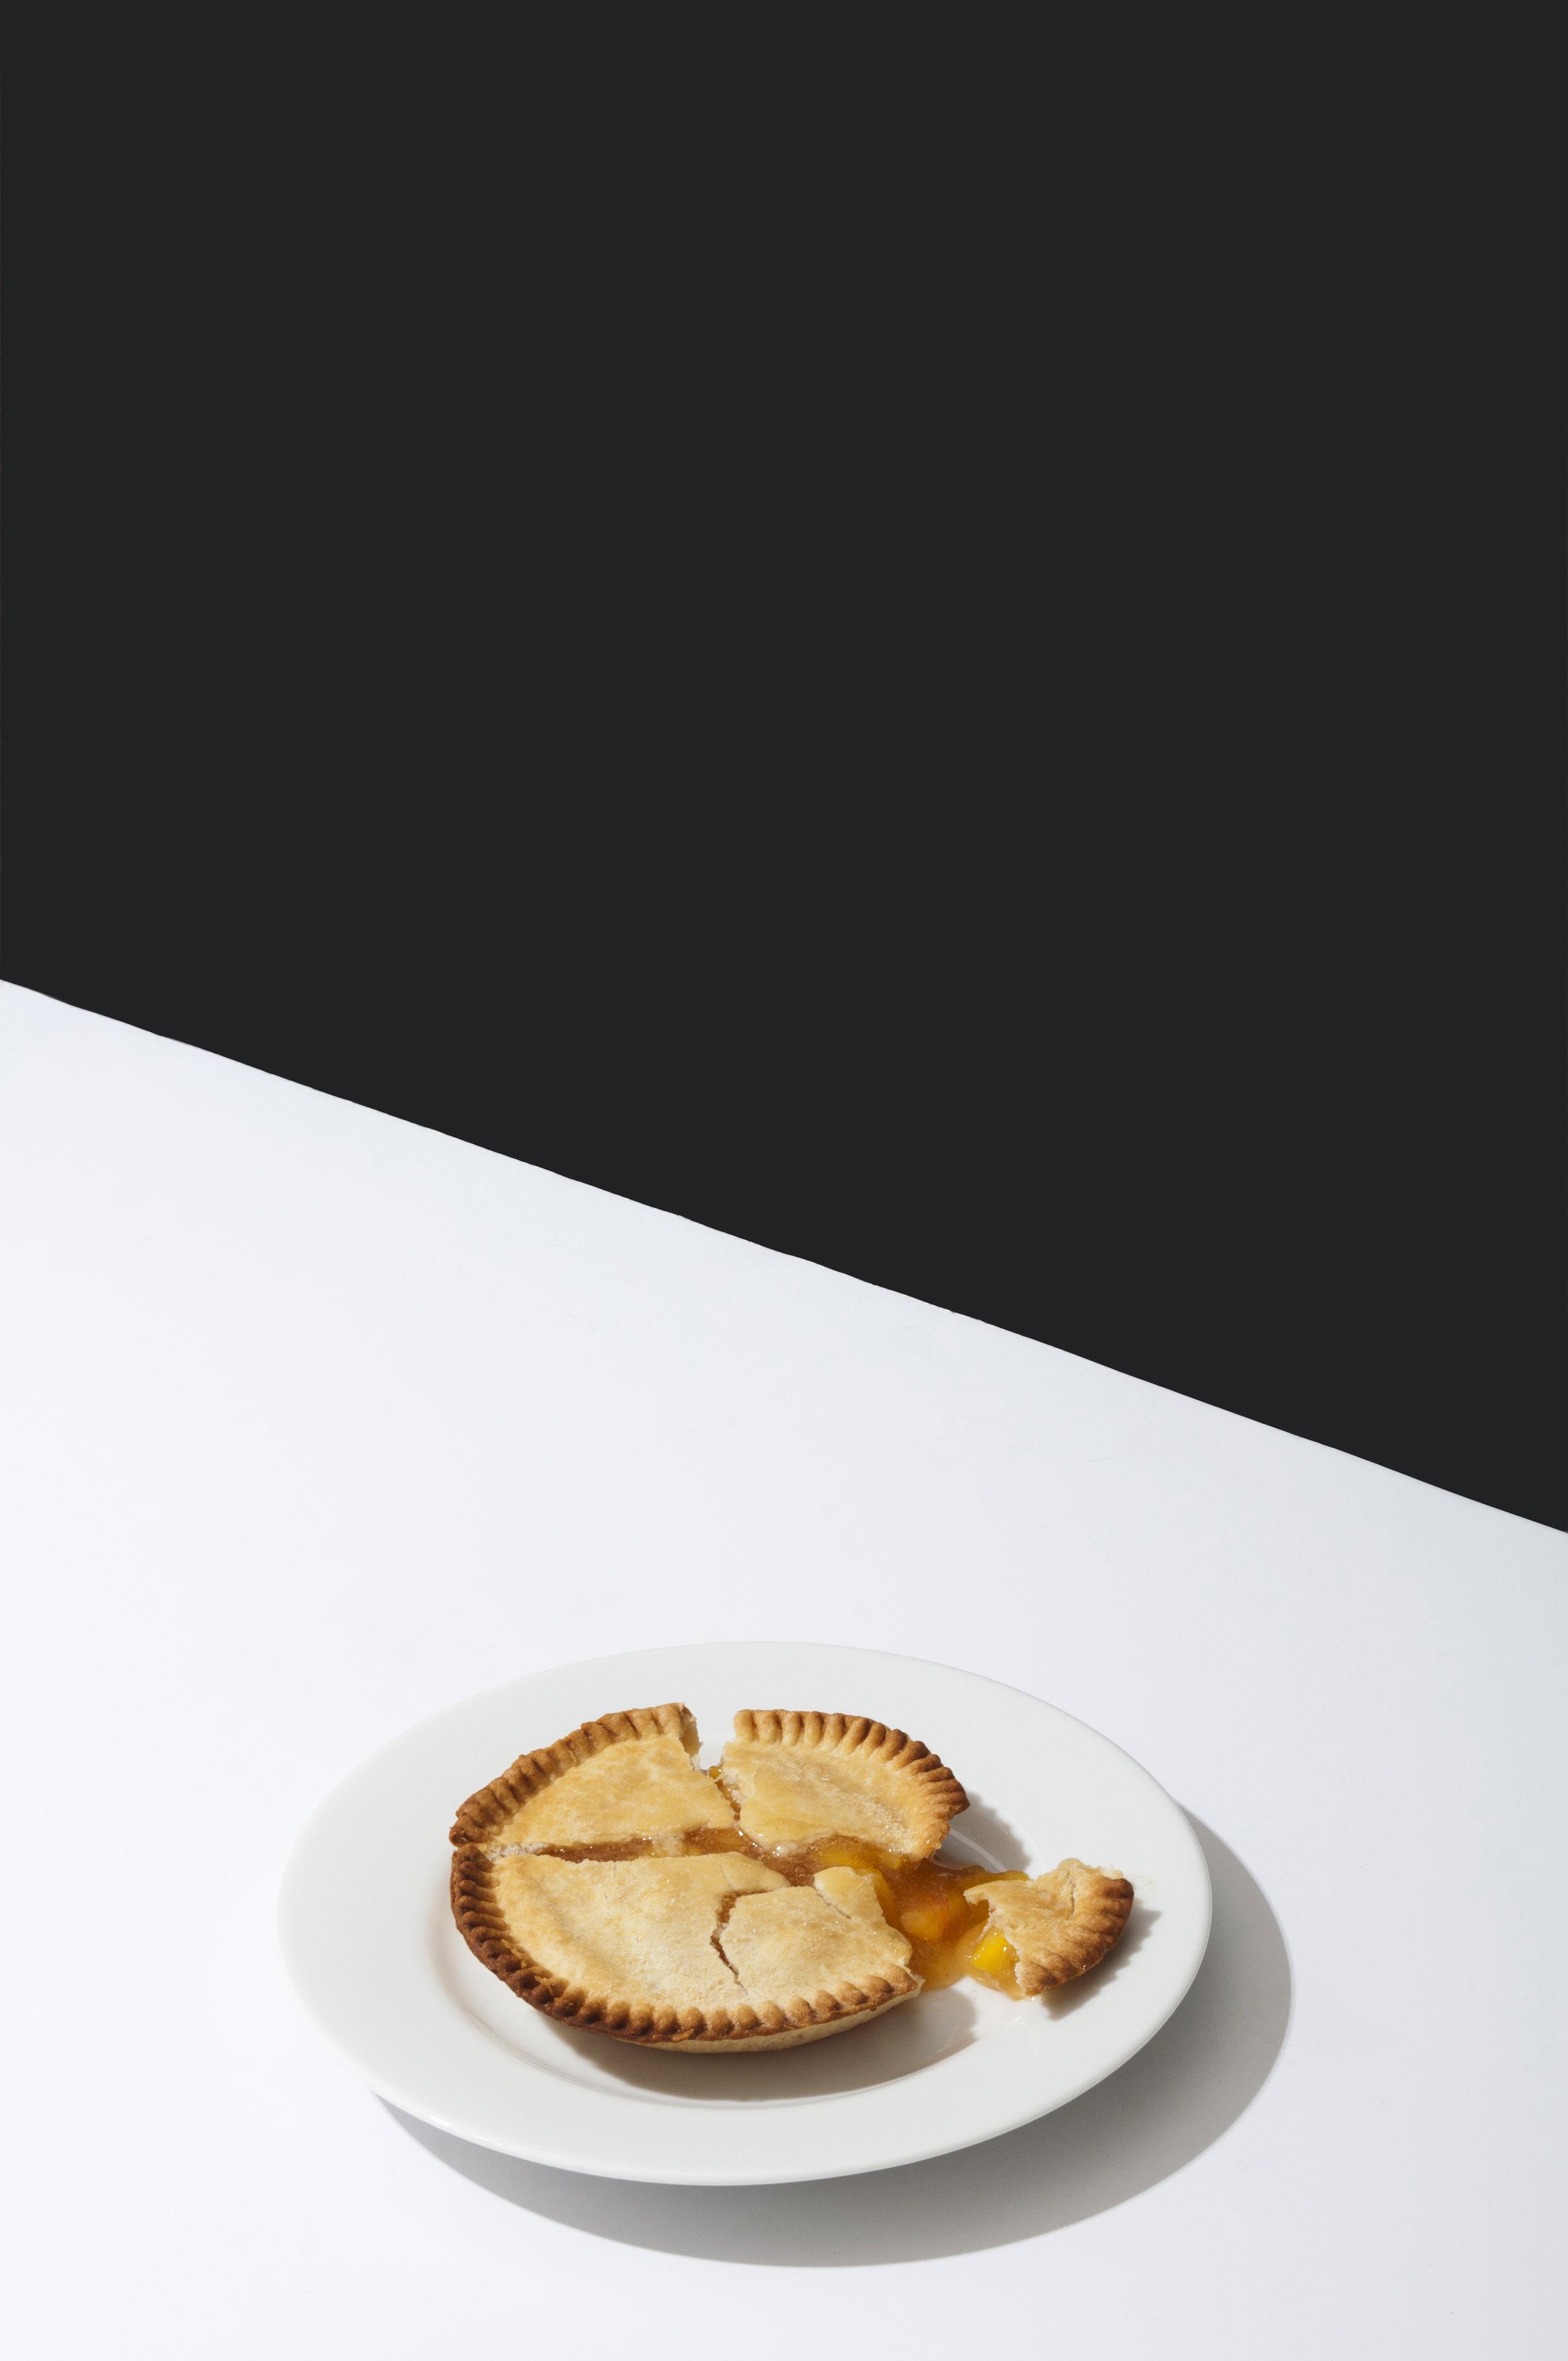 pie1 copy.jpg